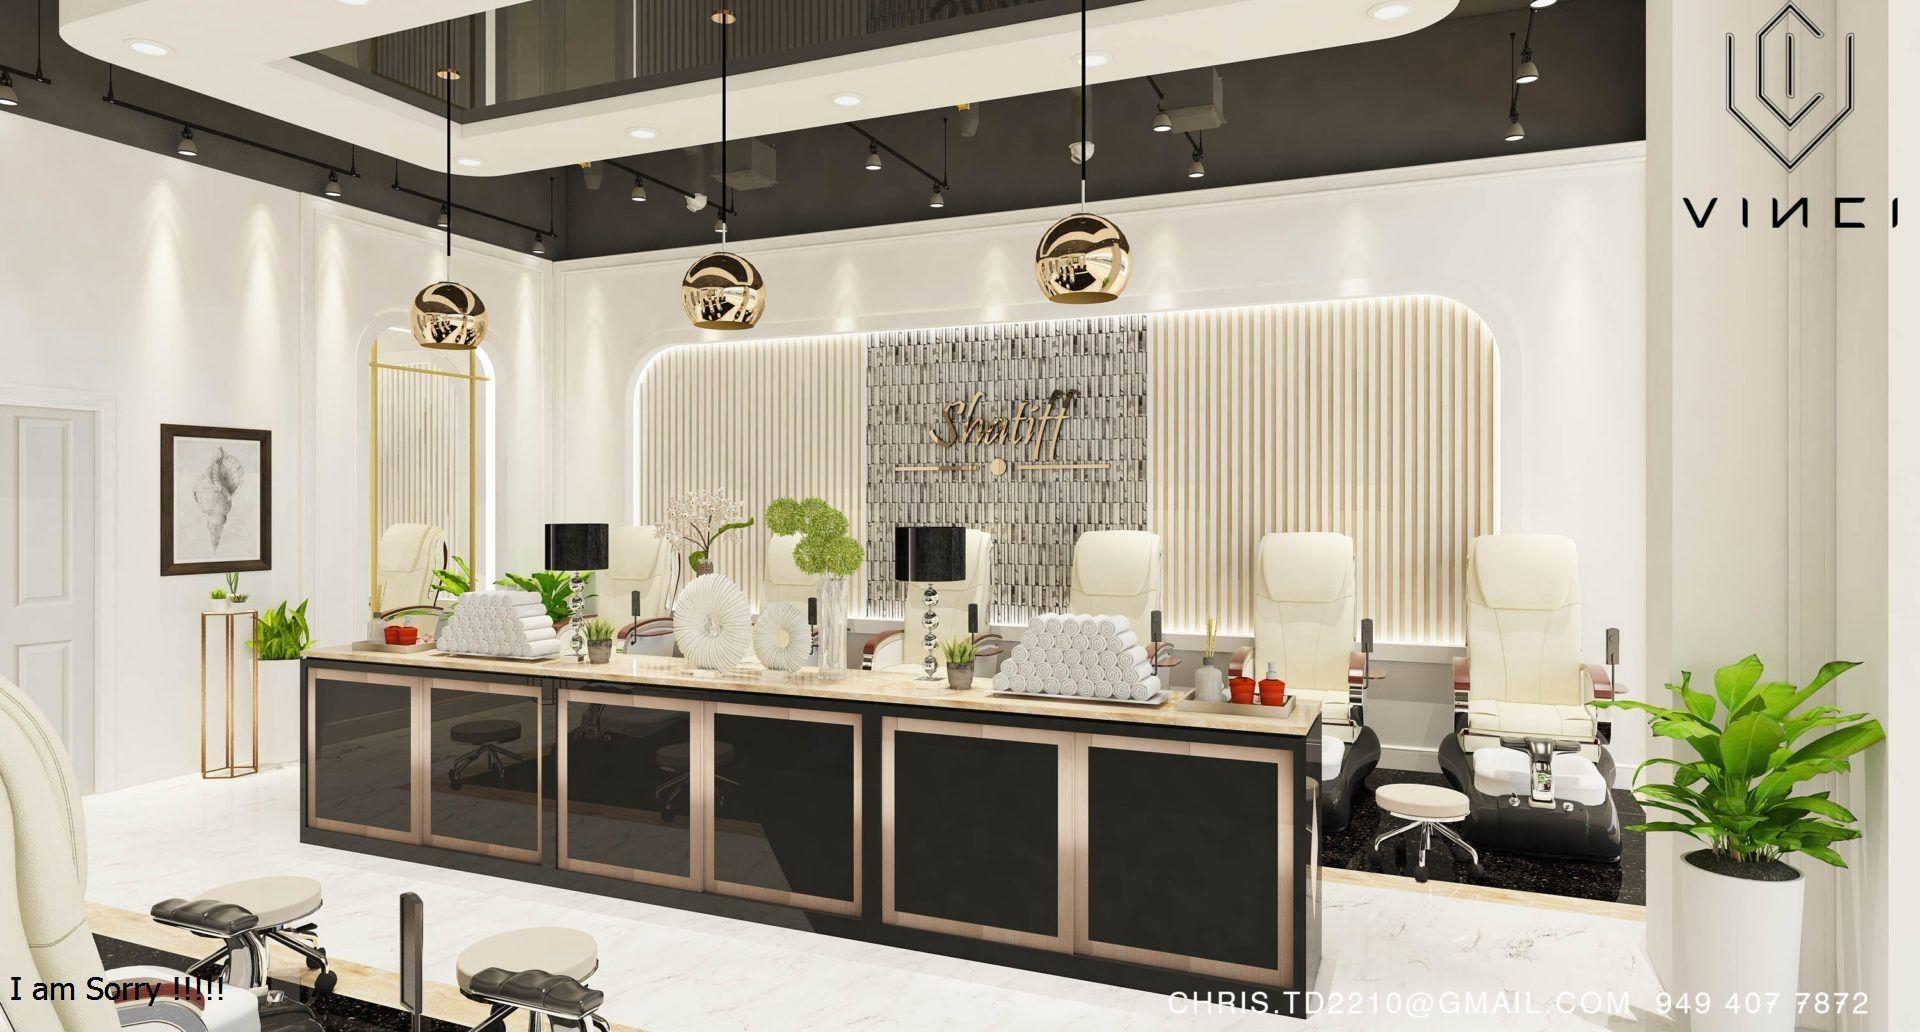 Luxury Nail Salon In 2020 Spa Lounge Salon Interior Design Nail Salon Interior Design